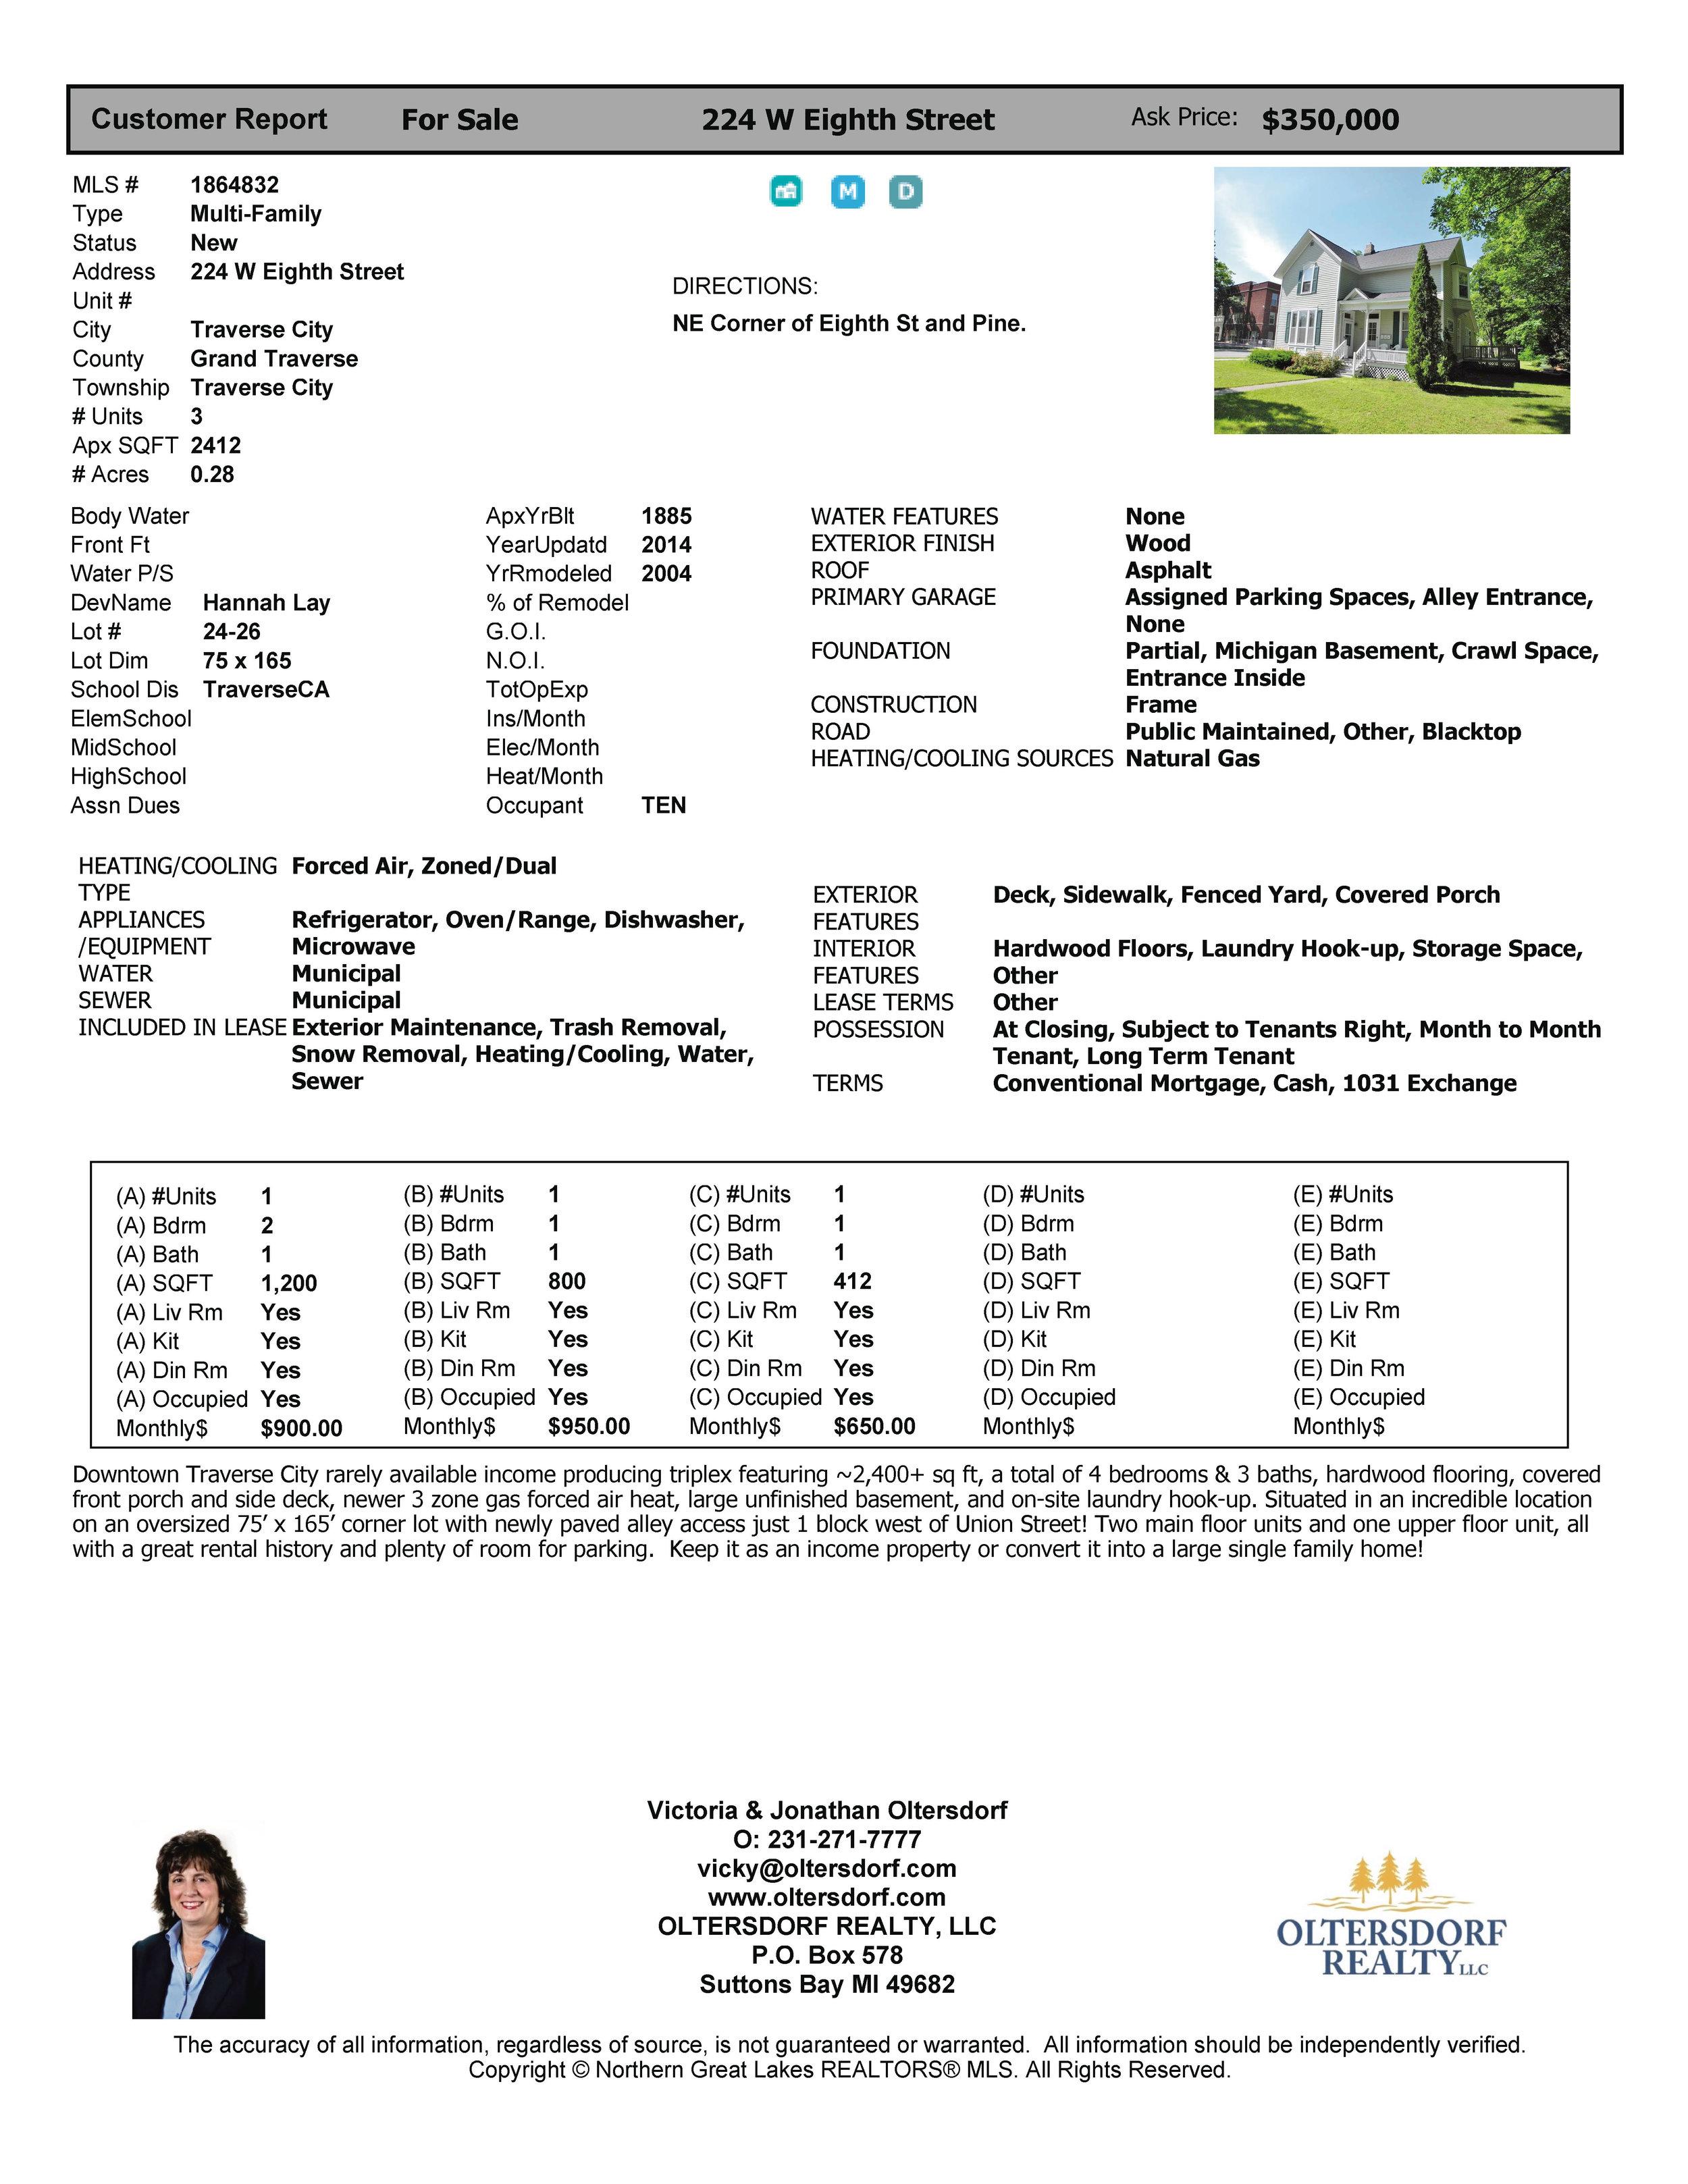 224 W Eighth St, Traverse City, MI – Downtown Traverse City Triplex Marketing Packet - For sale by Oltersdorf Realty LLC (9).jpg